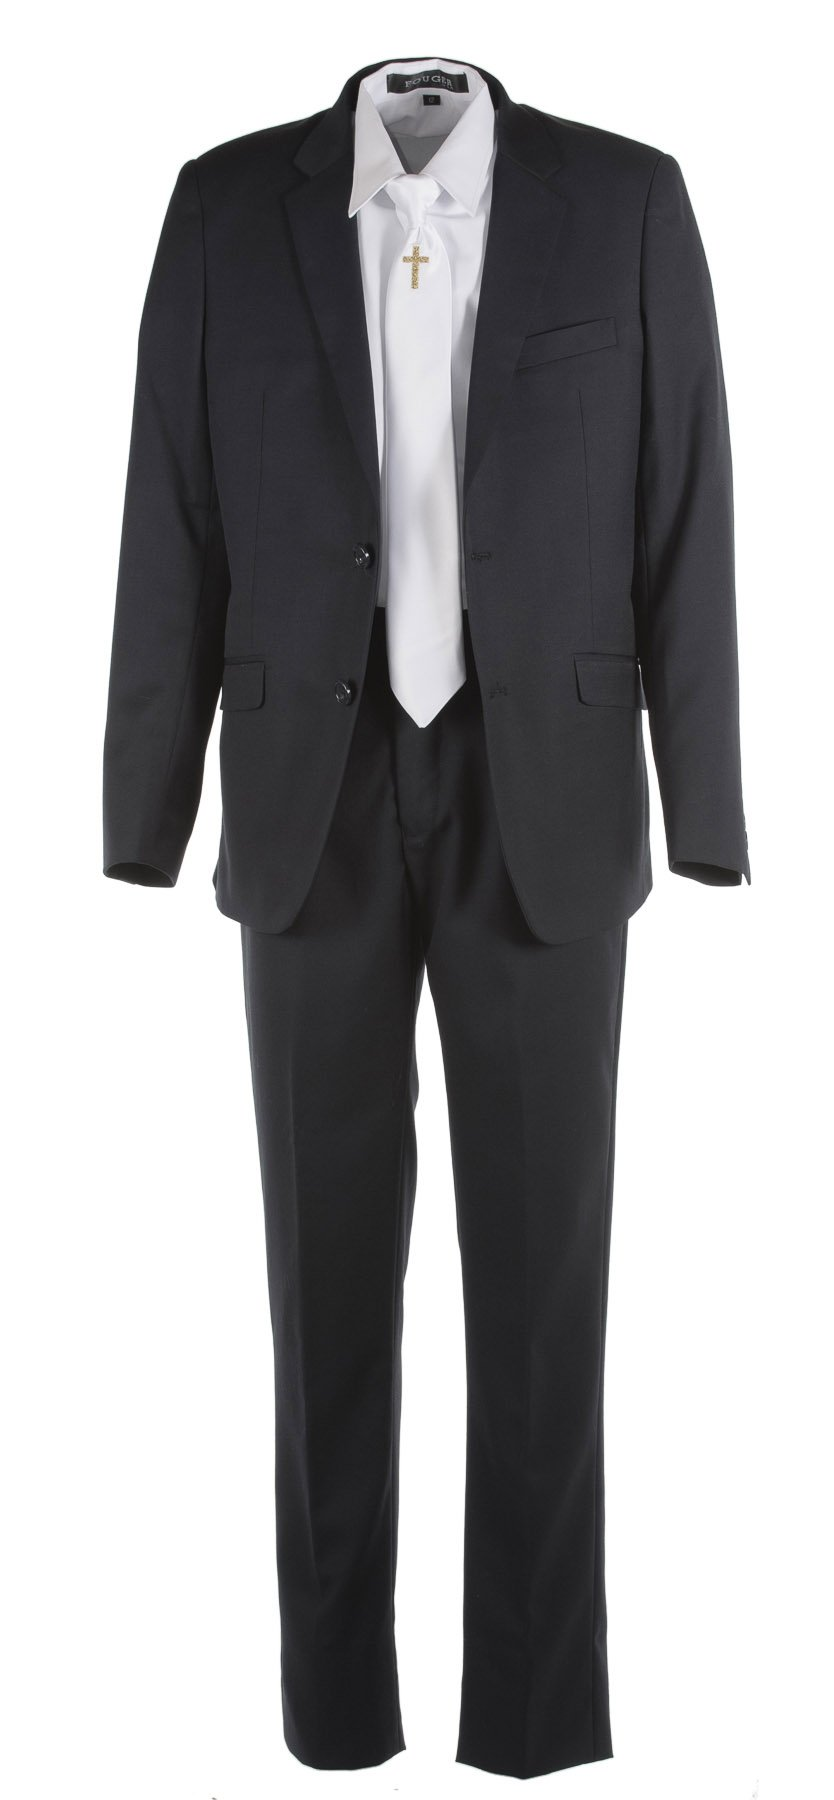 Tuxgear Boys Black Slim Fit Communion Suit With Gold Cross Dress Tie (Boys 18)